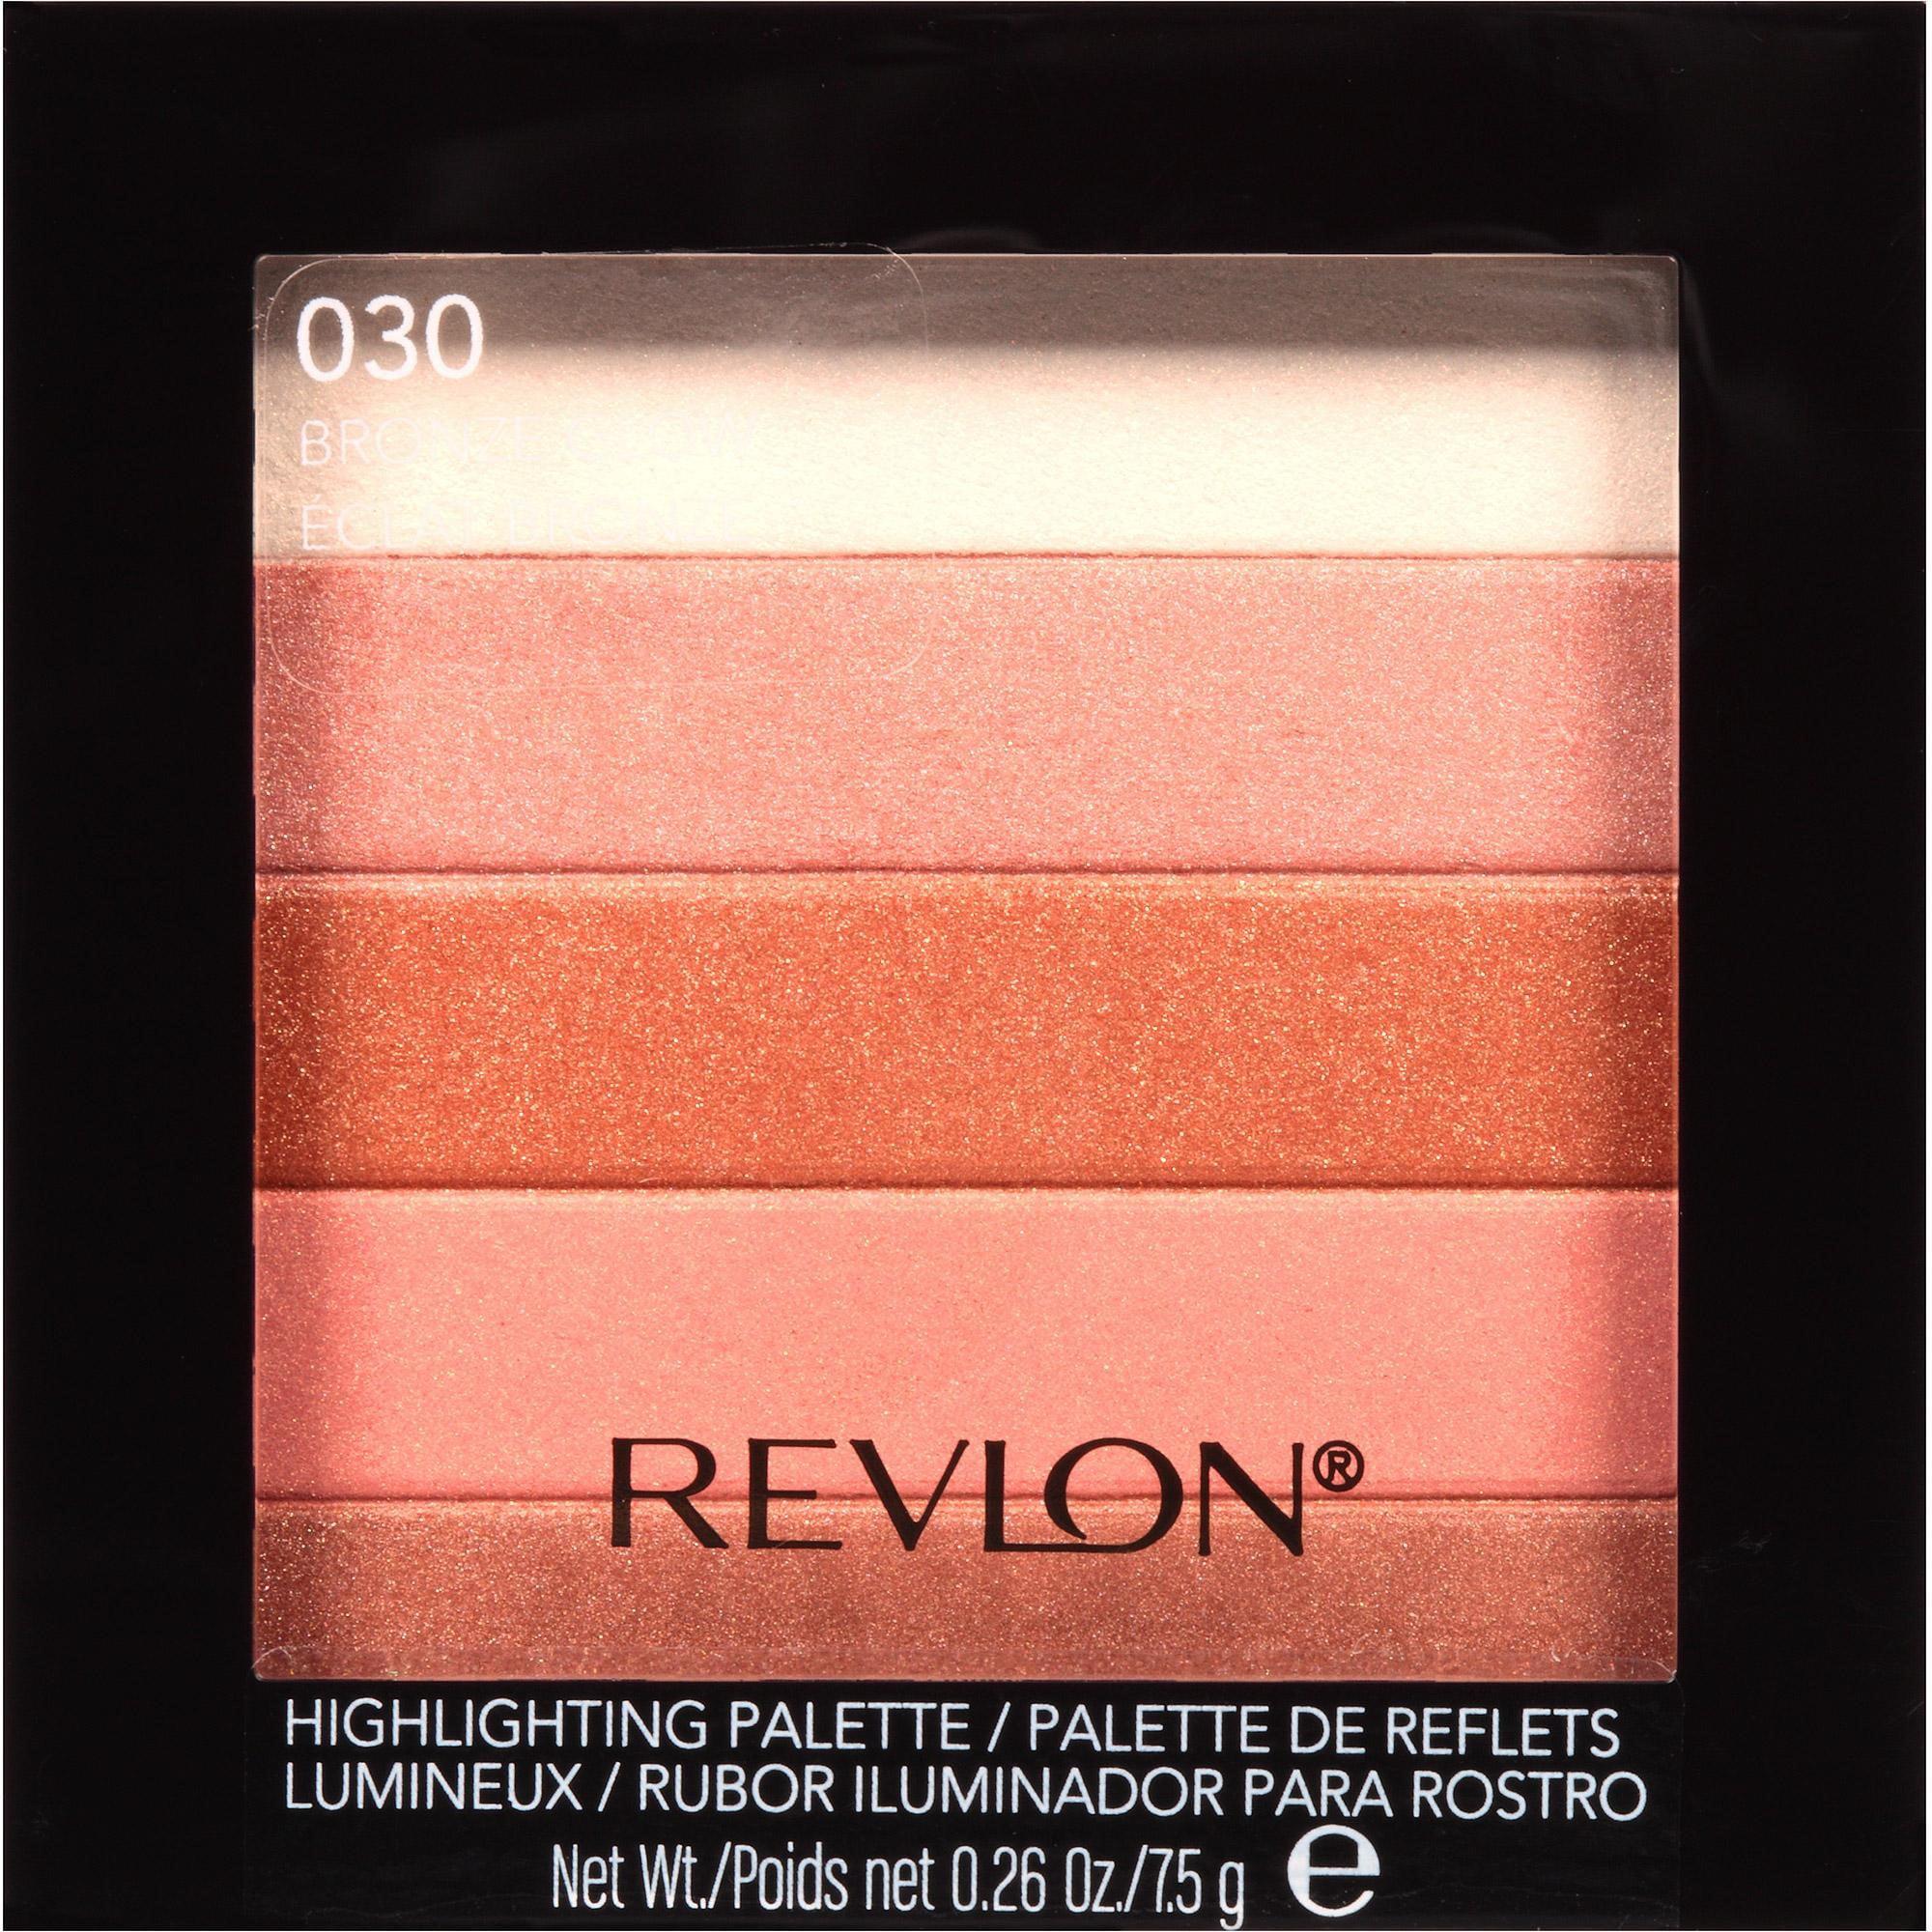 Revlon Highlighting Pallette, 030 Bronze Glow, 0.26 Oz